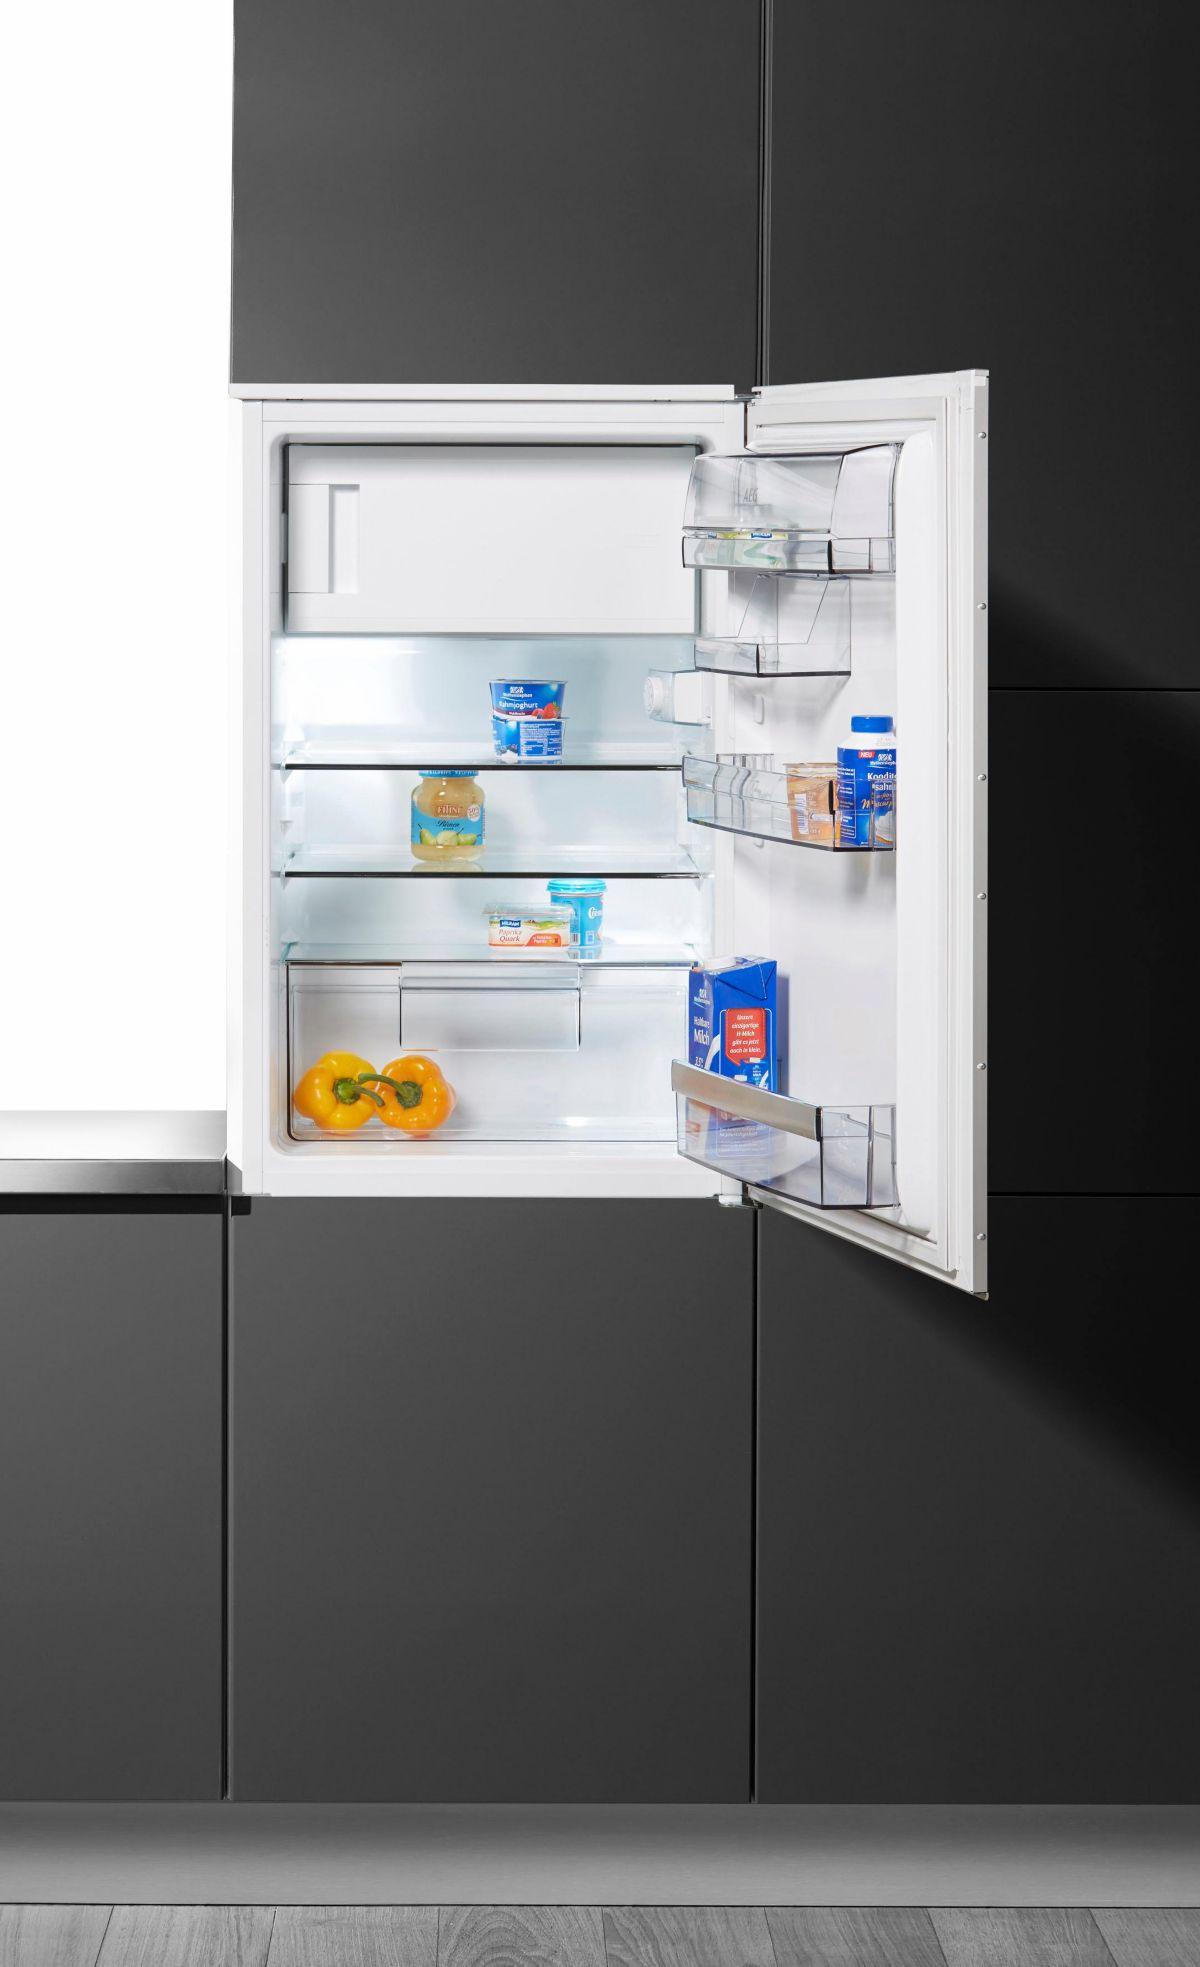 AEG Einbau-Kühlschrank SANTO SFB58821AE, Energi...